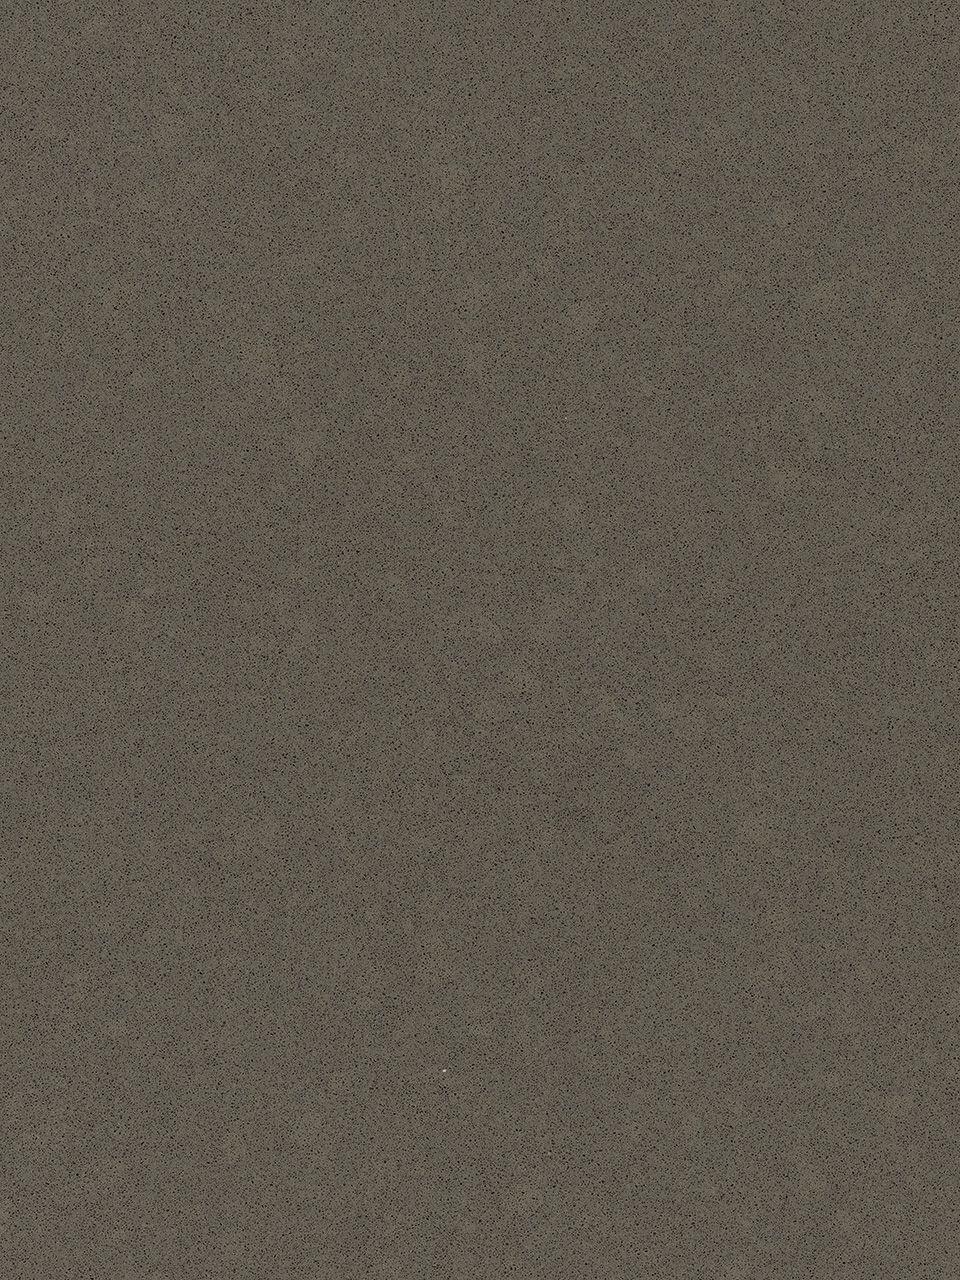 Cambria clyde kitchen and bathroom countertop color - Devon Cambria Design Palette Collection Of 100 Natural Stone Countertop Designs Colors